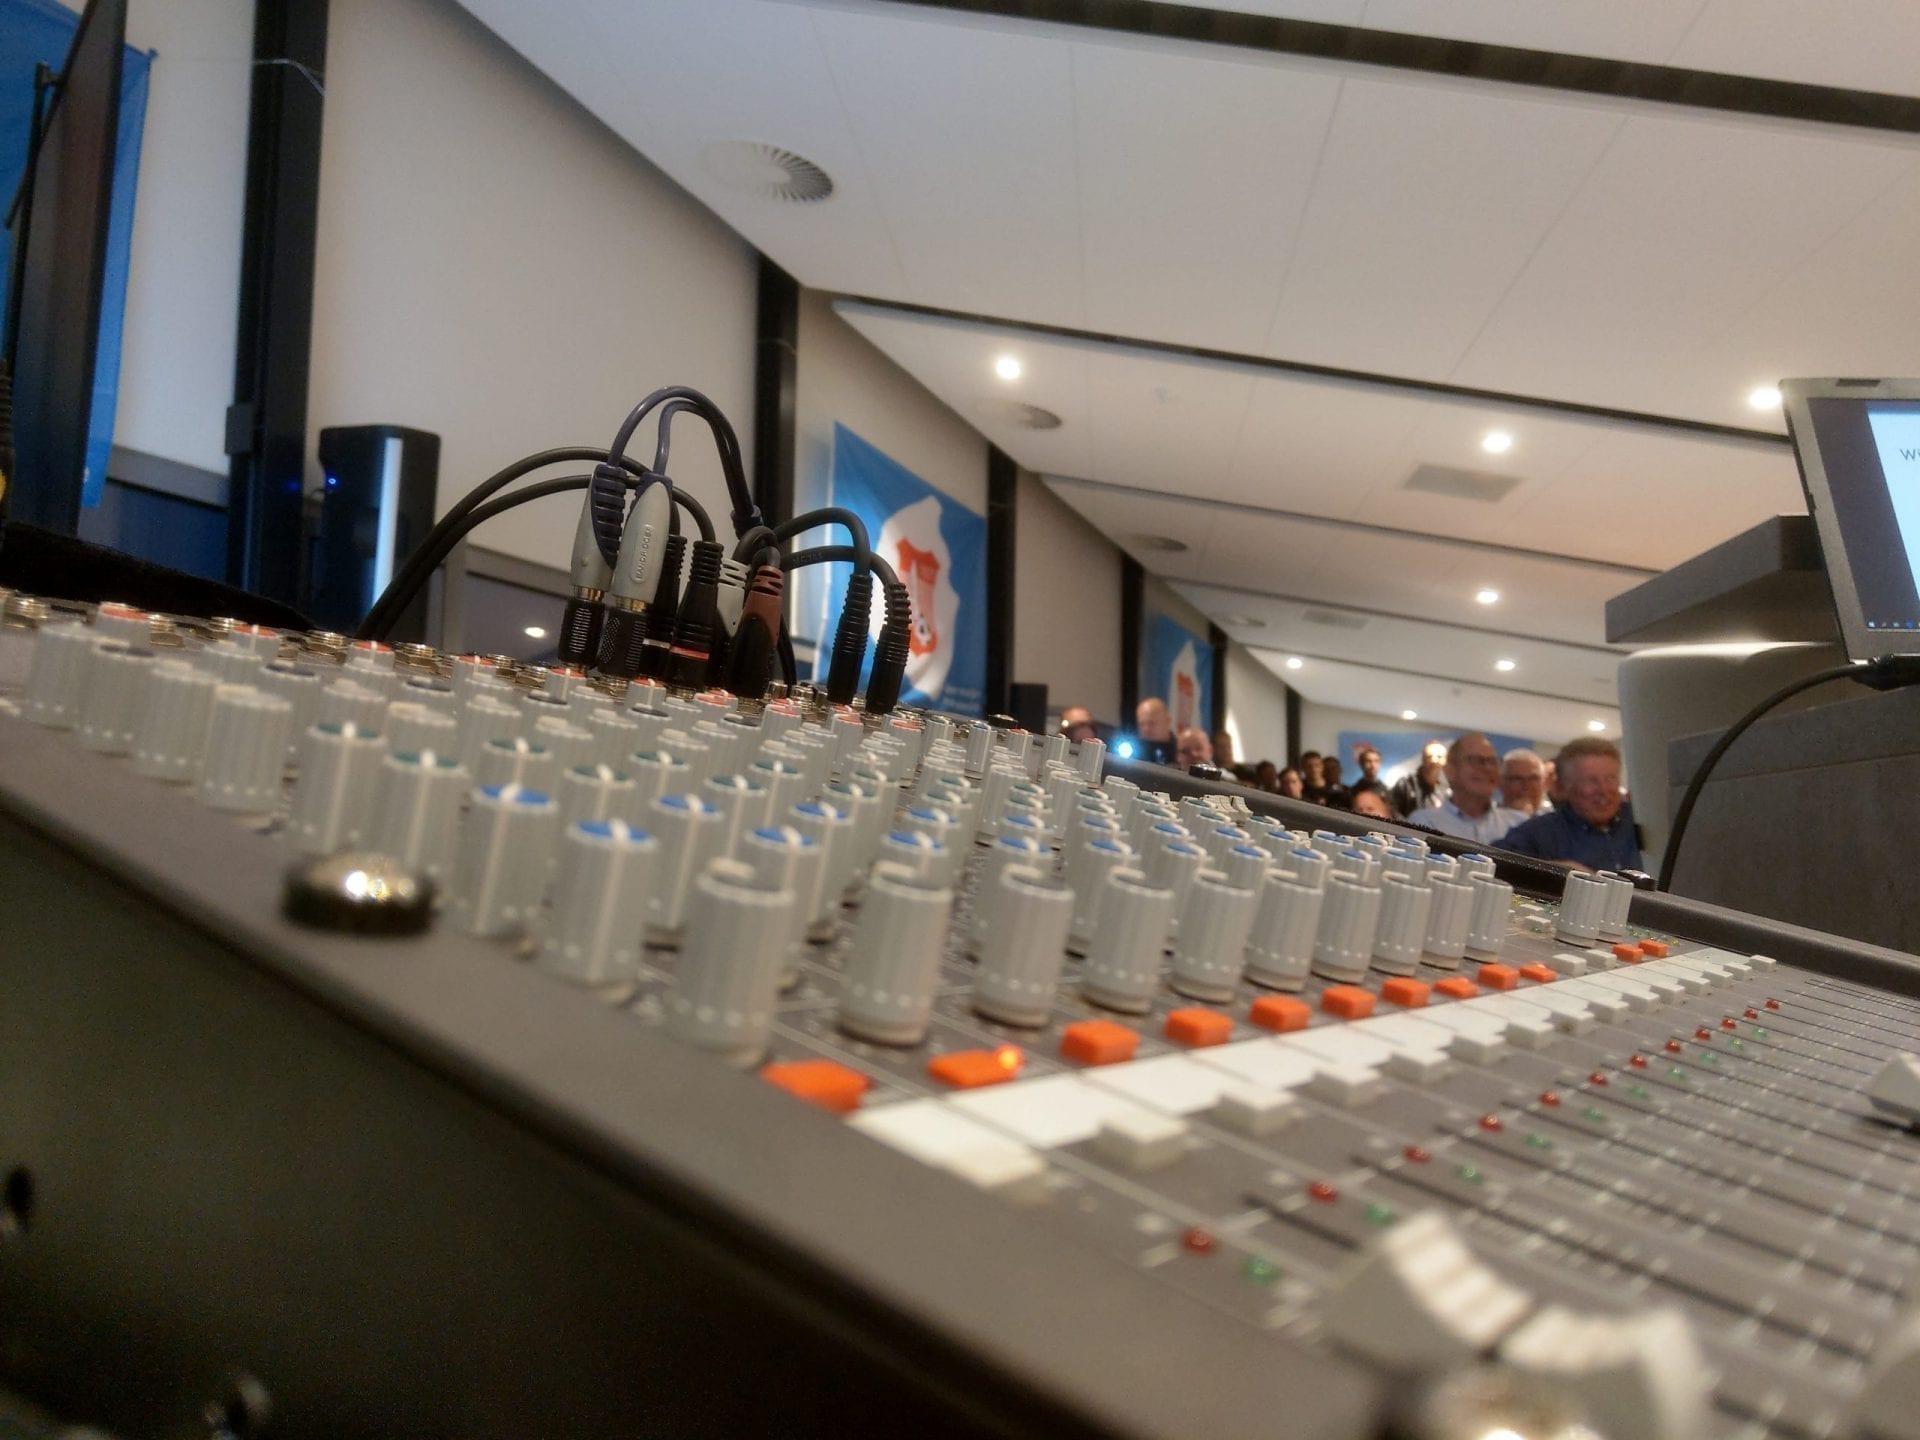 Lezing geluid IMAG0079 scaled - Licht en geluid